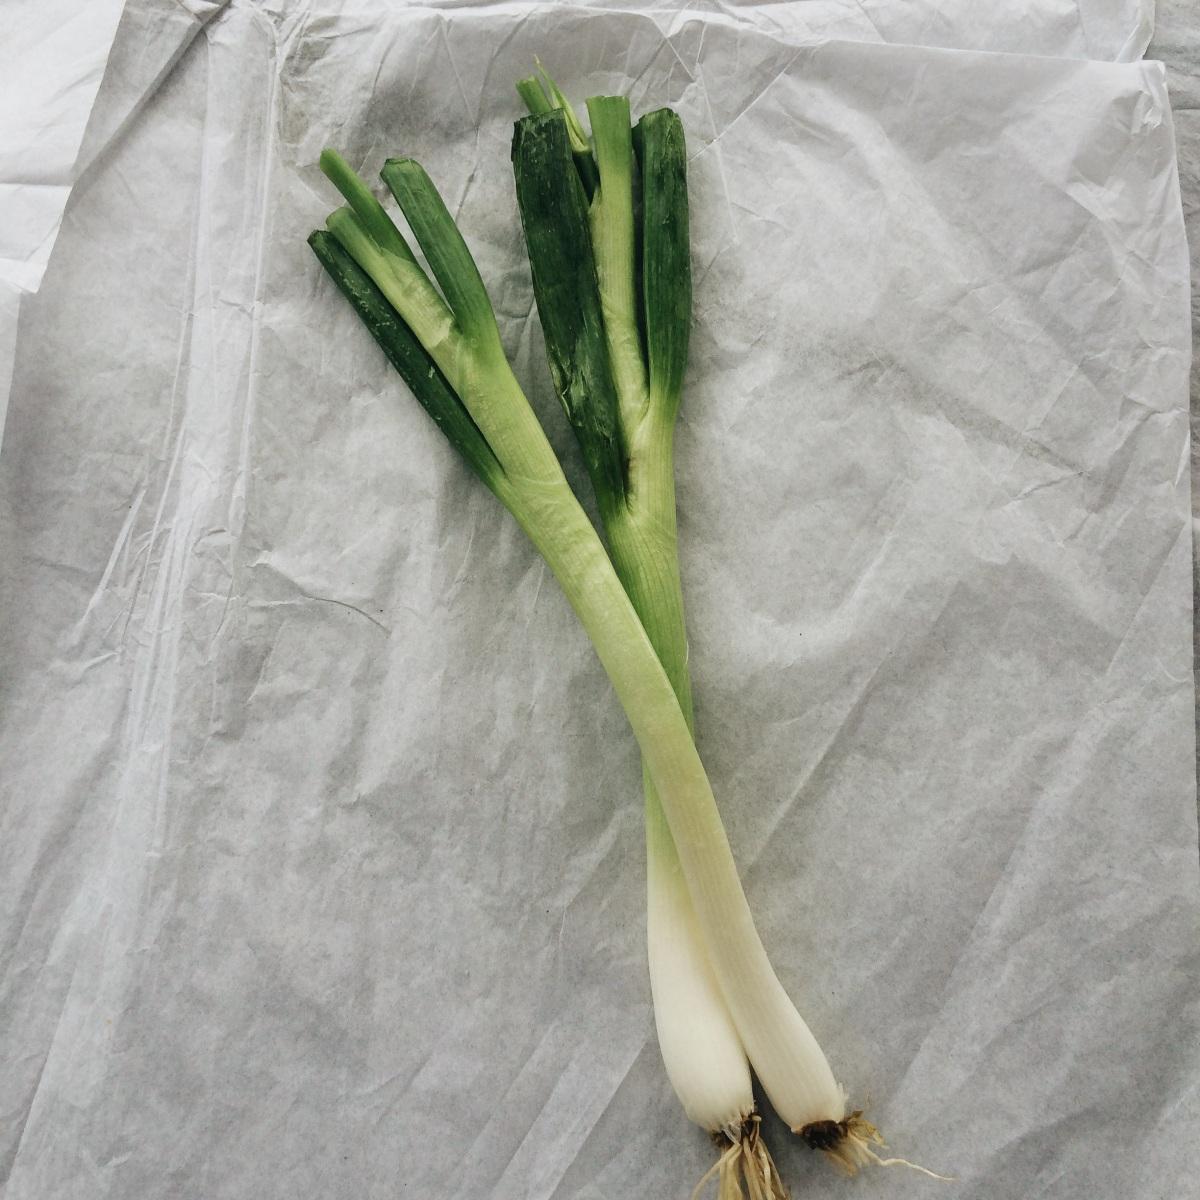 Egyptian Walking Onions